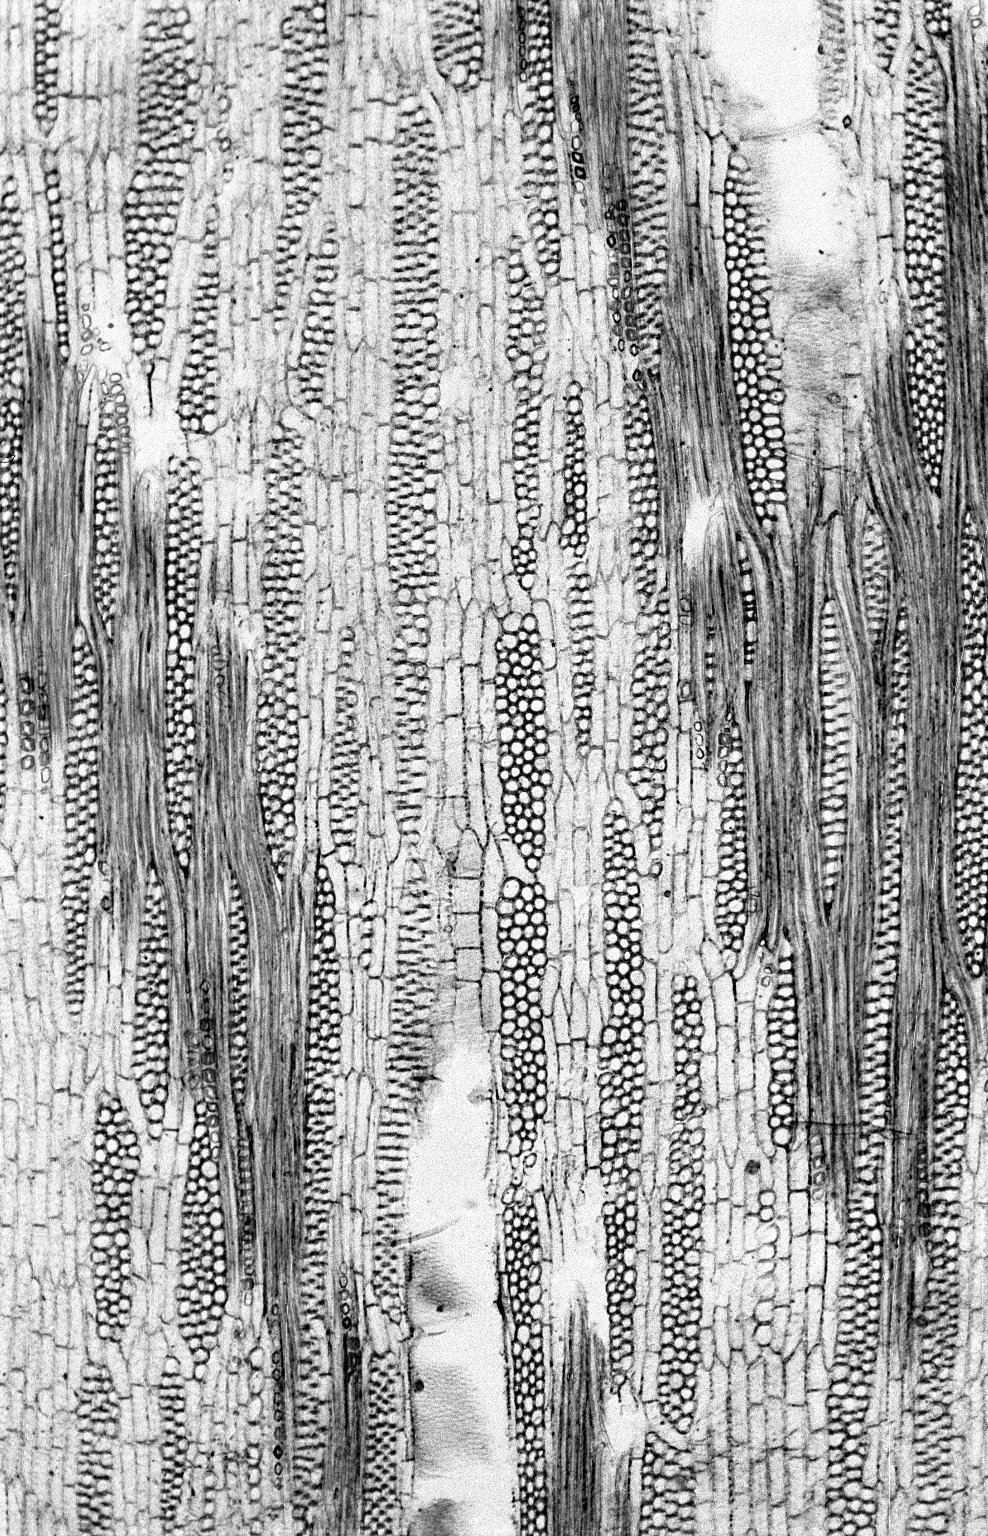 LEGUMINOSAE PAPILIONOIDEAE Aganope thyrsiflora